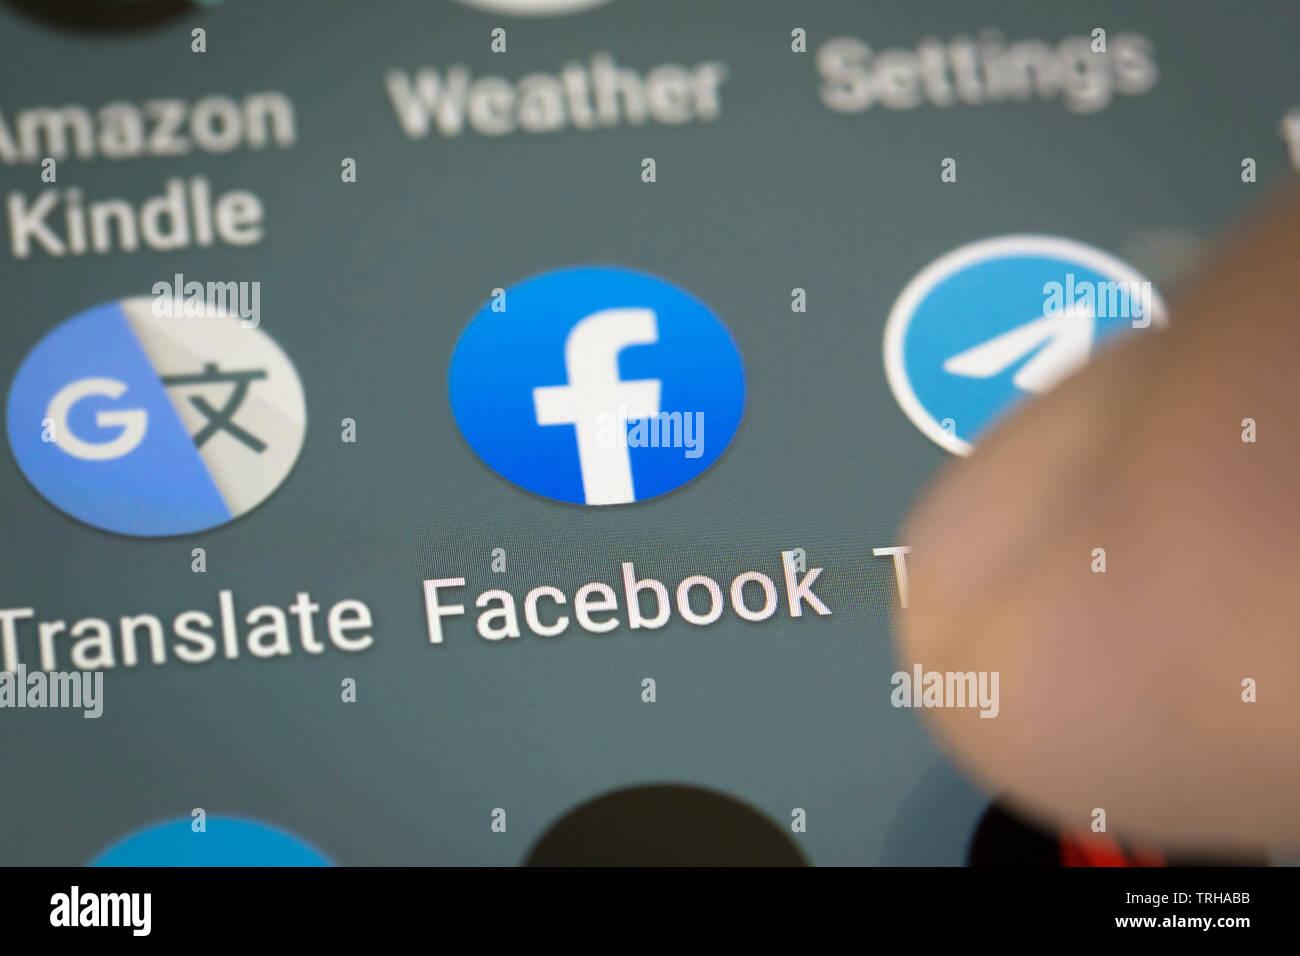 Facebook logo icon on mobile phone screen - Stock Image